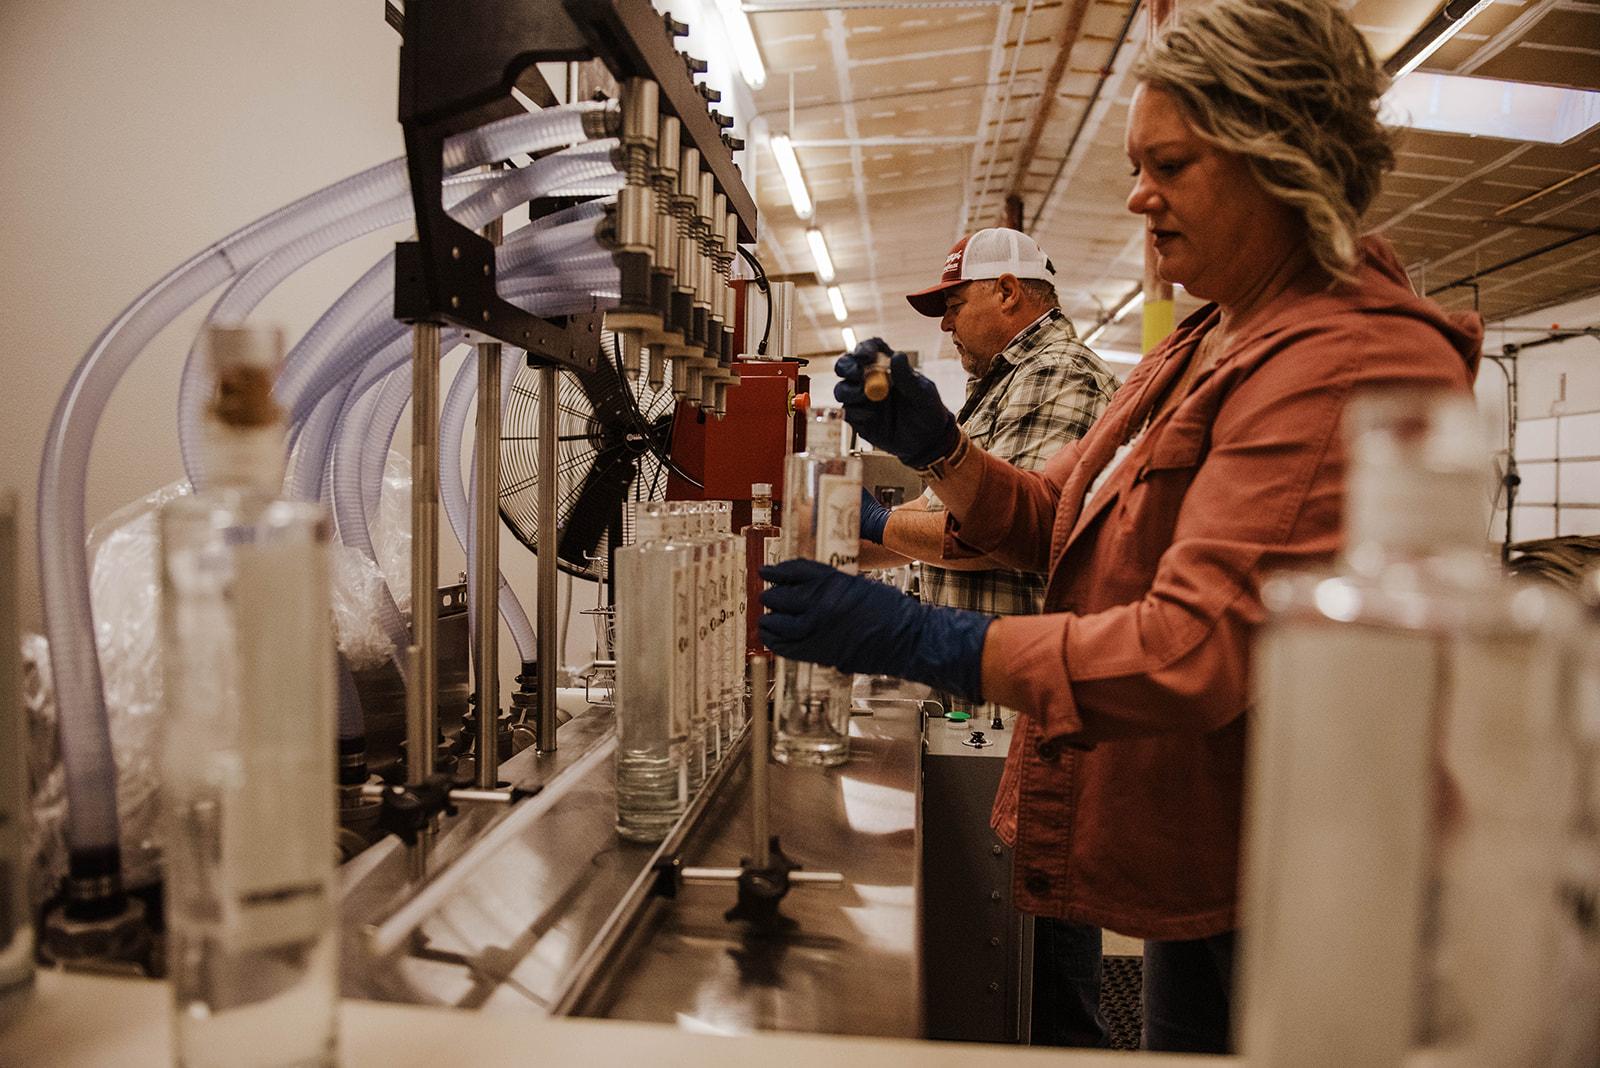 Olympia Master Distiller Lesa Givens bottling Olympia Artesian Vodka.(image courtesy of Sarah Russell)